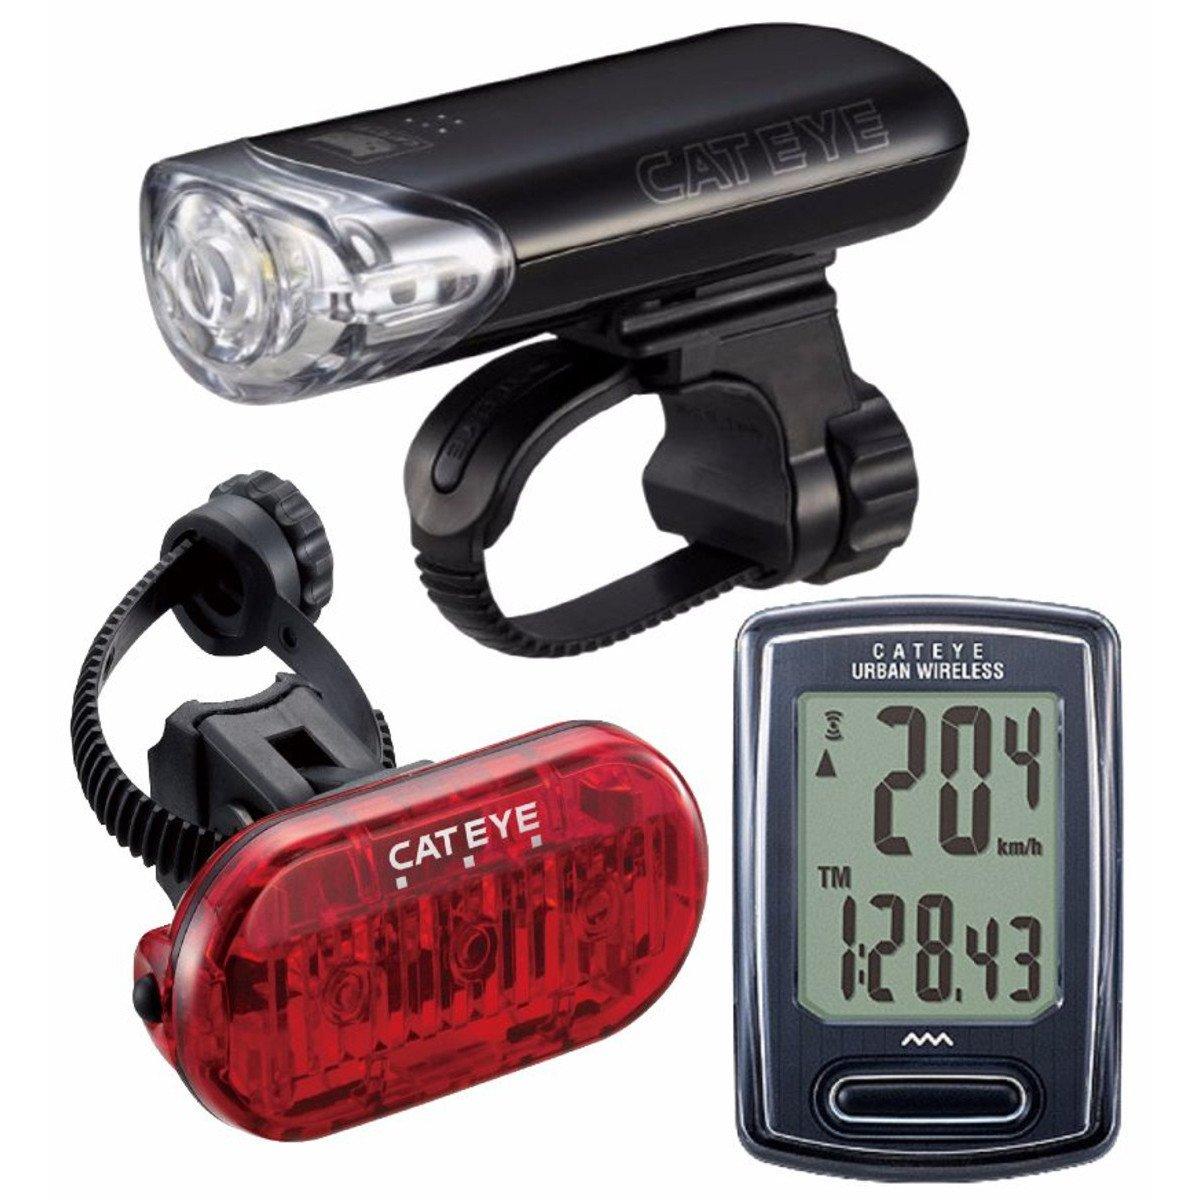 CAT EYE - Go Kit Wireless with HL-EL140 Headlight, Urban Wireless Cycle Computer, and Omni 3 Rear Bike Light